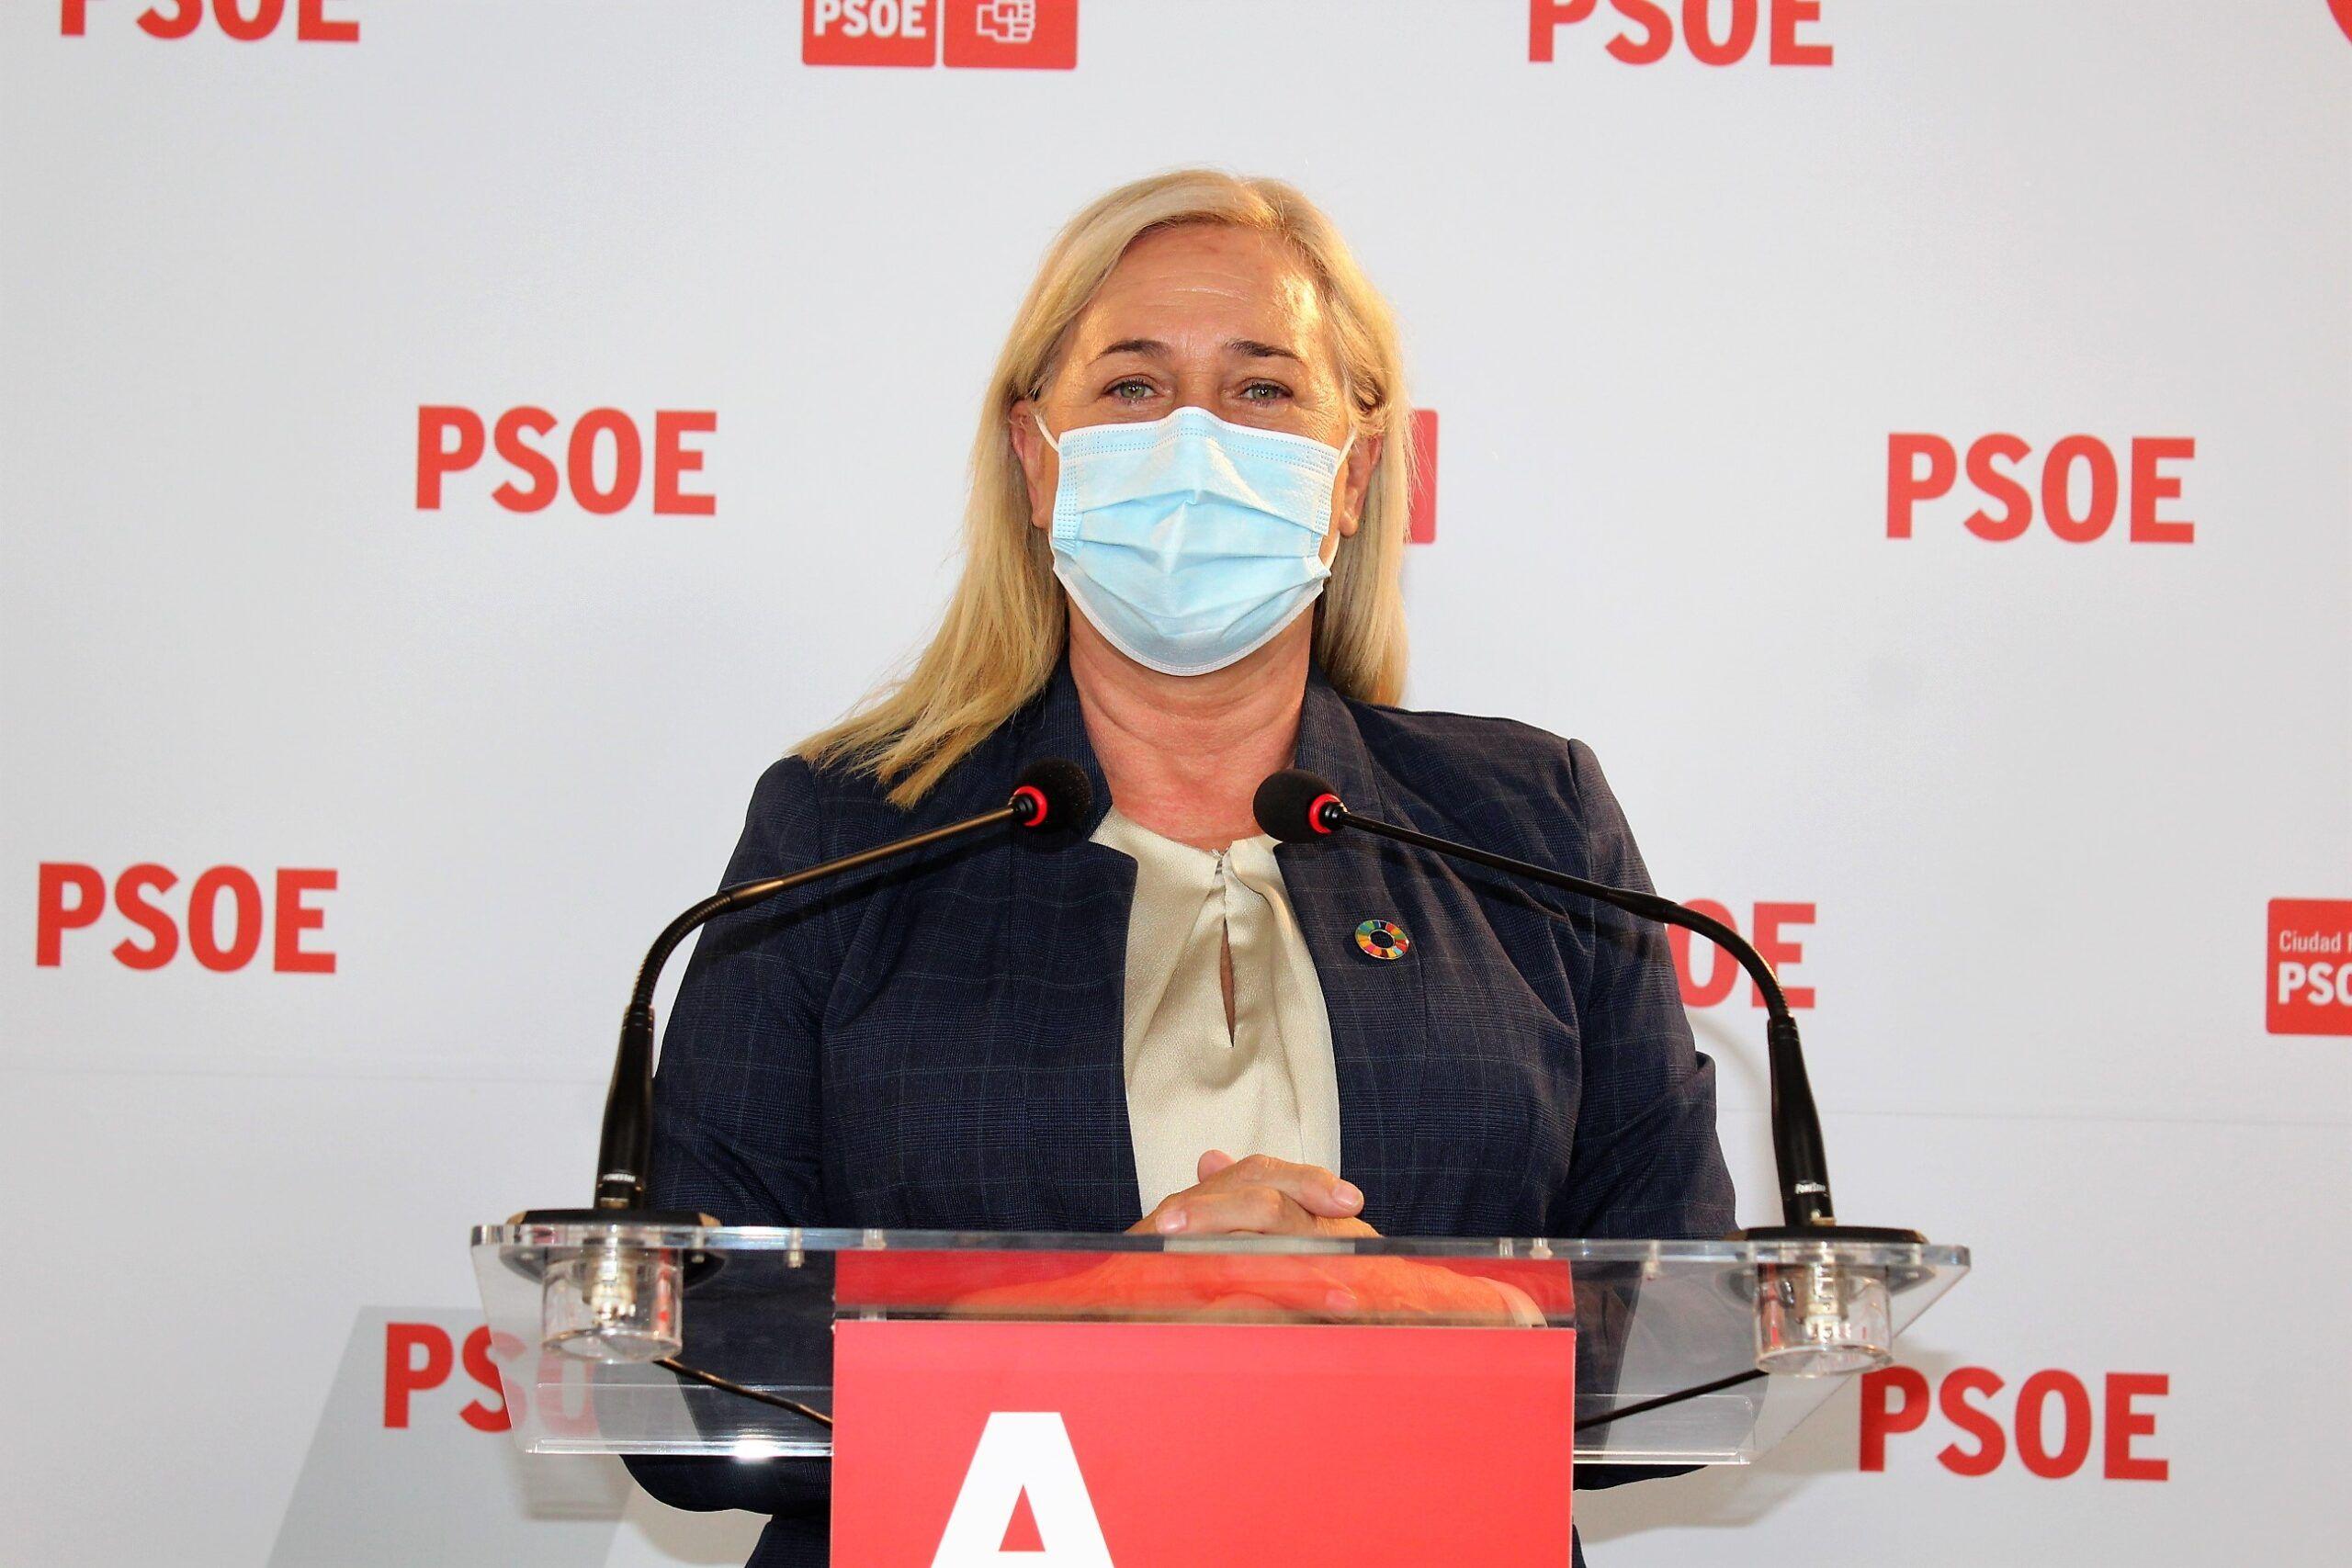 Mínguez (PSOE):